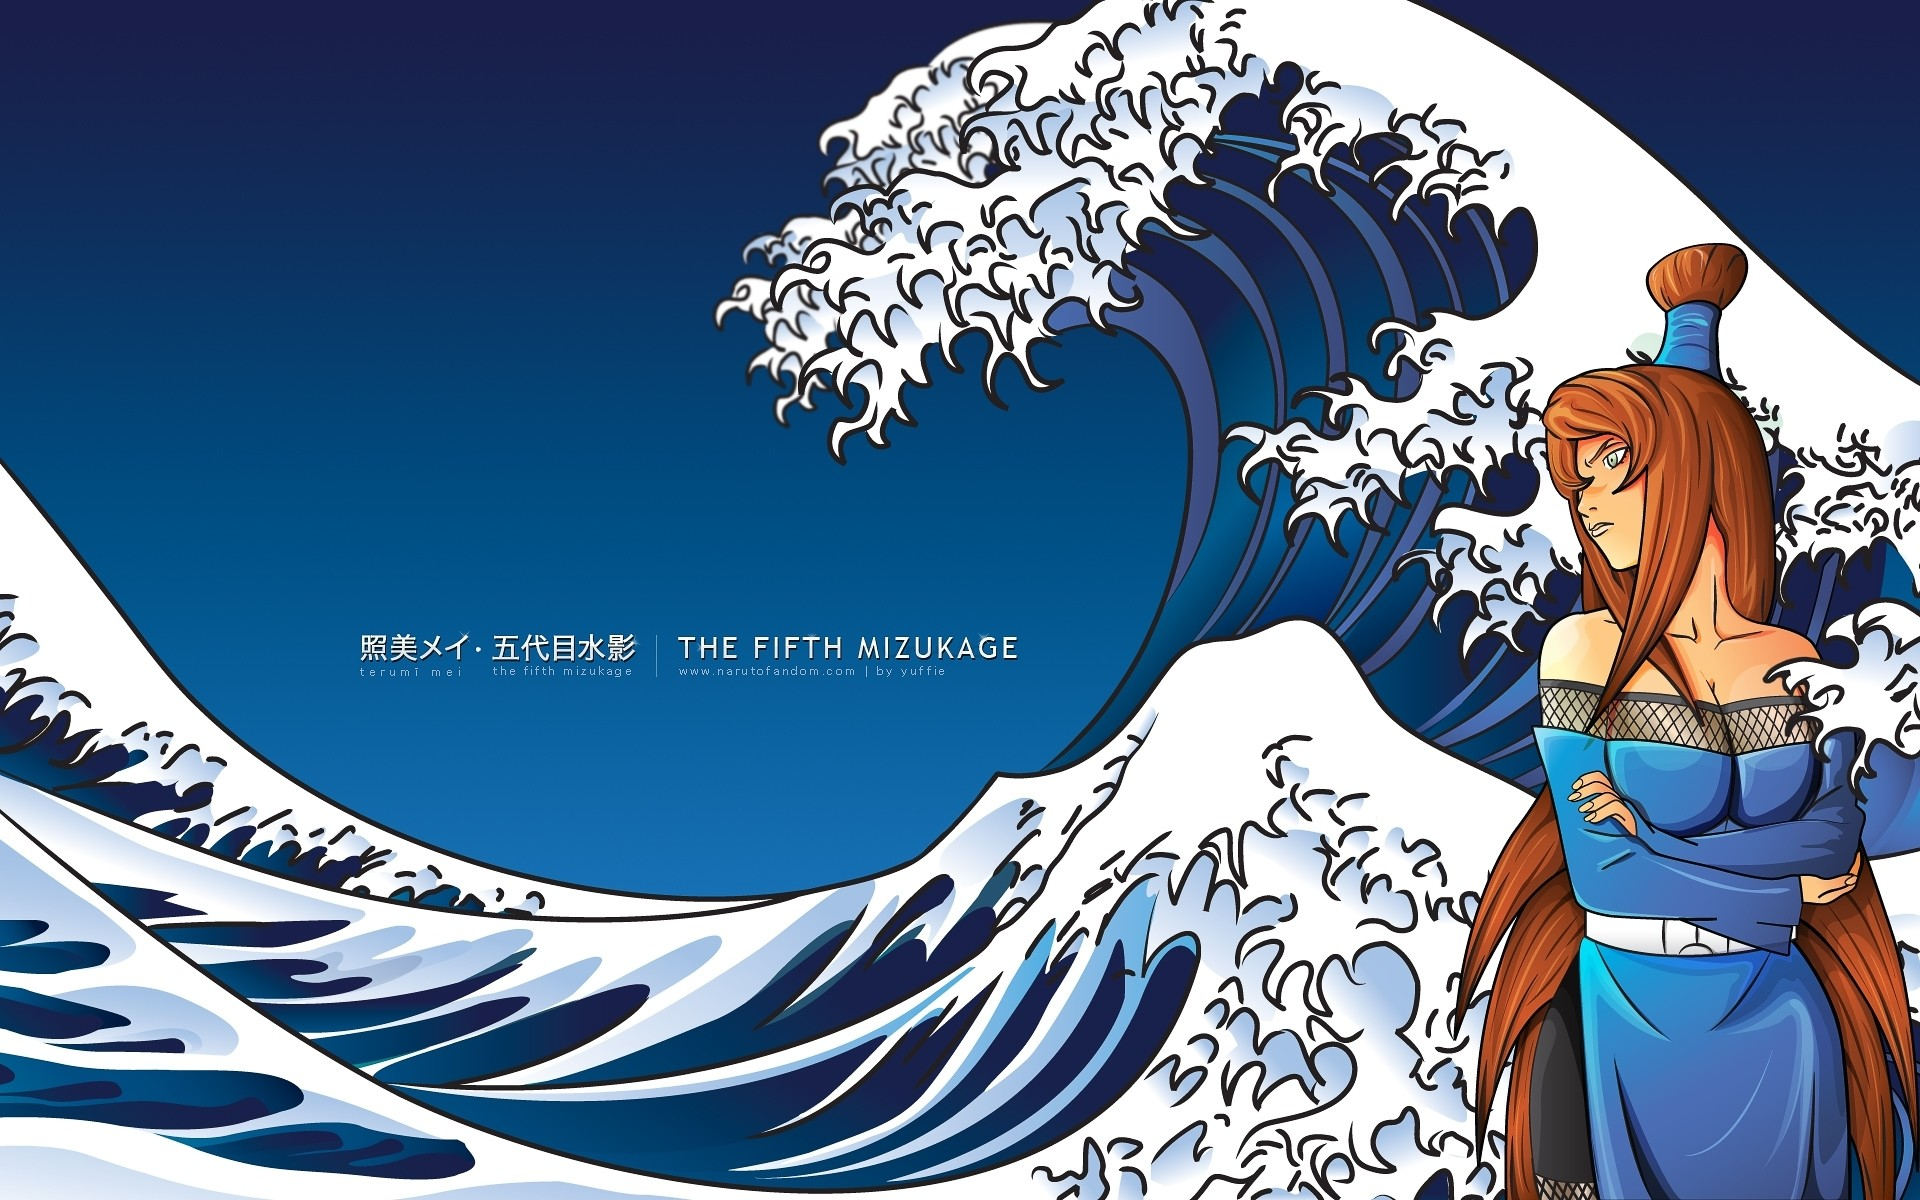 Waves naruto shippuden mizukage mei terumi the great wave off kanagawa  wallpaper